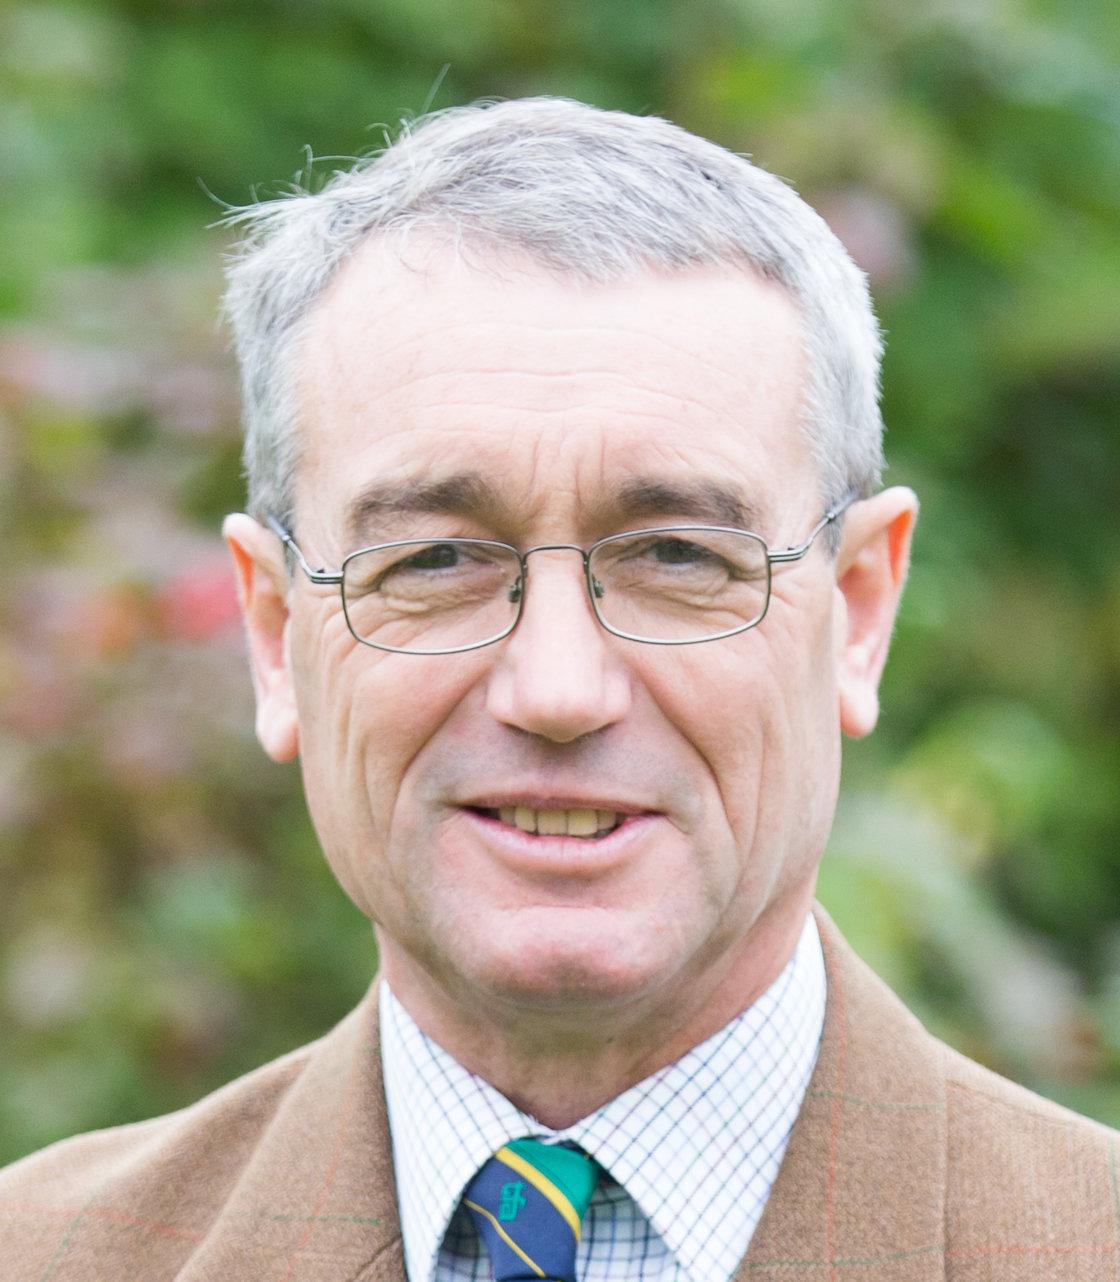 James Gray - Headshot